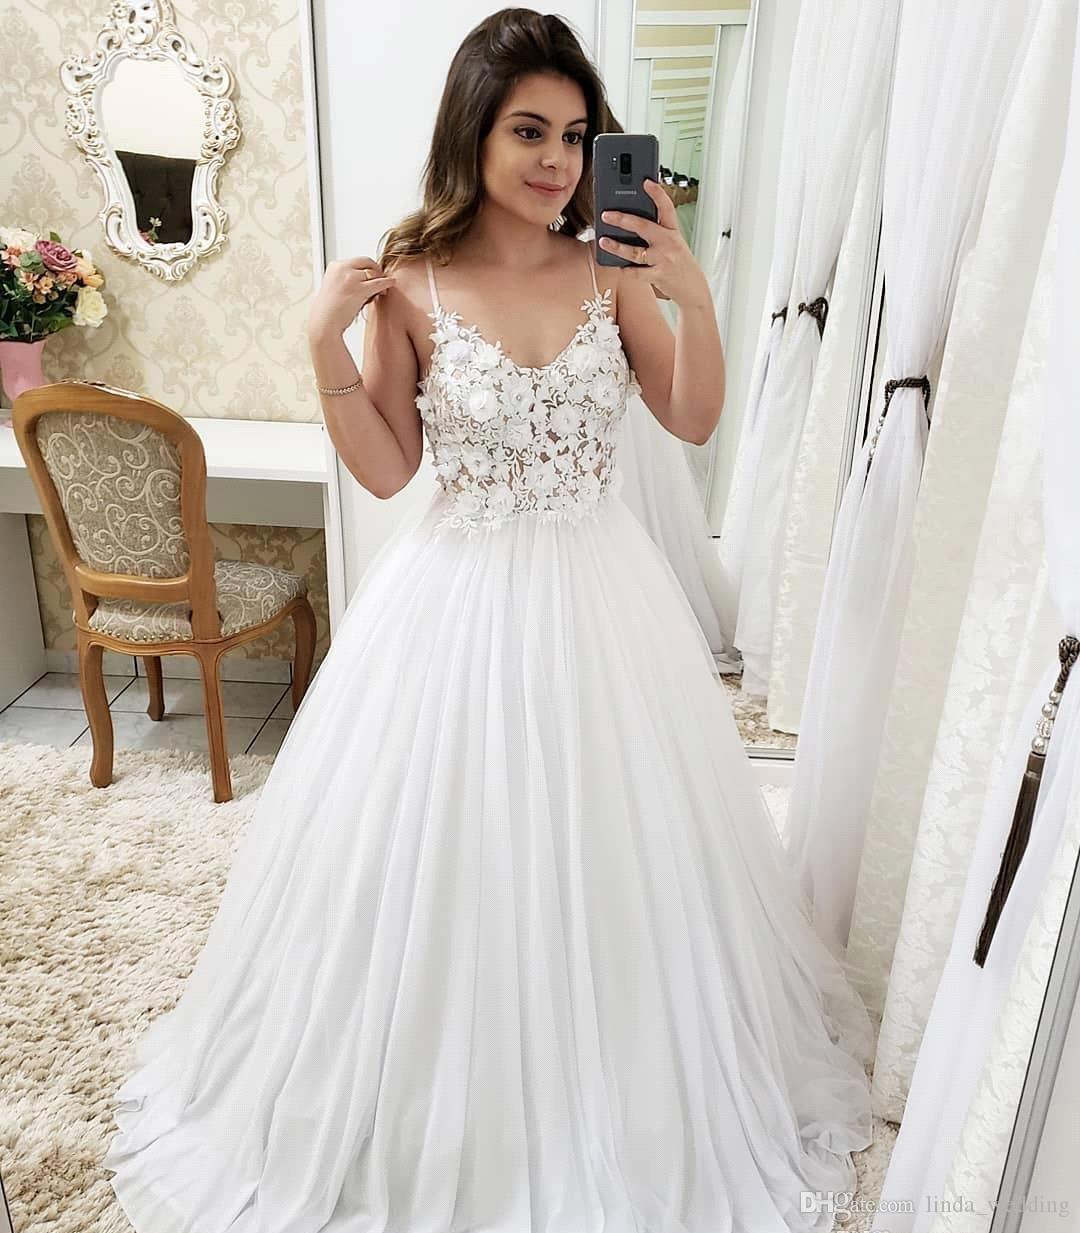 Spaghetti Strap Wedding Gown Receptions discount